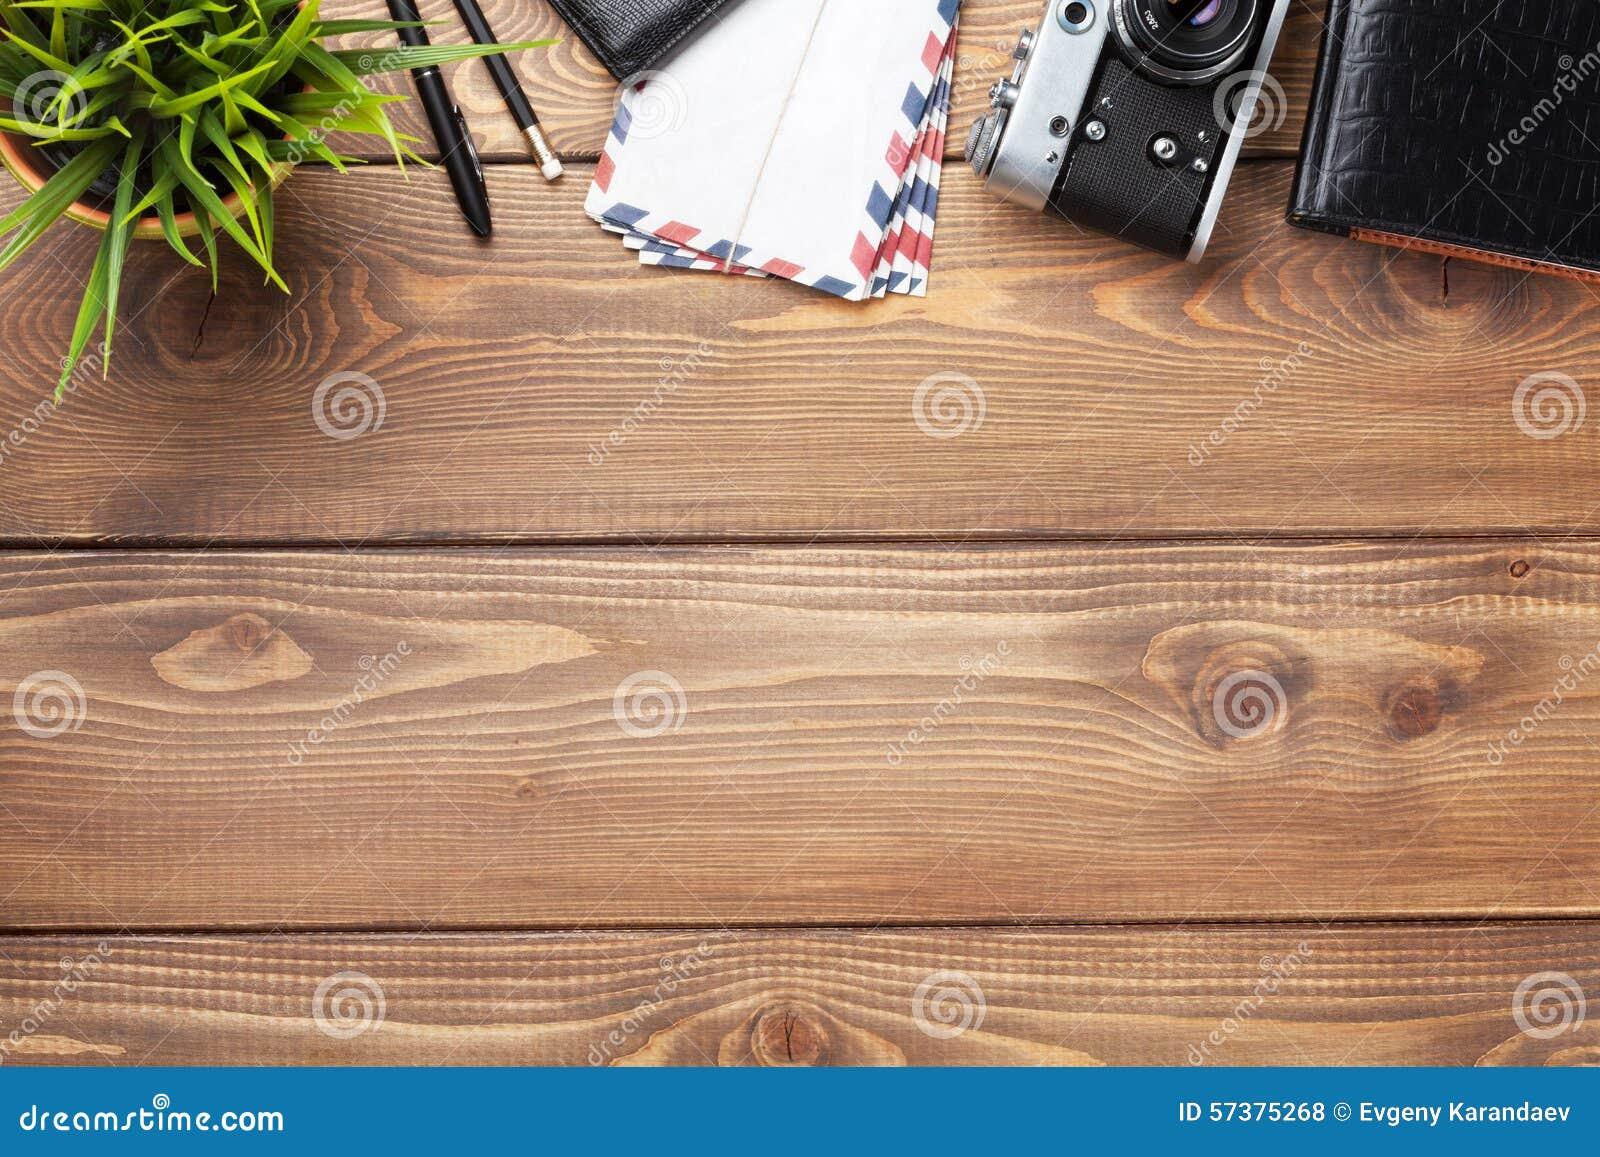 Camera en levering op bureau houten bureau